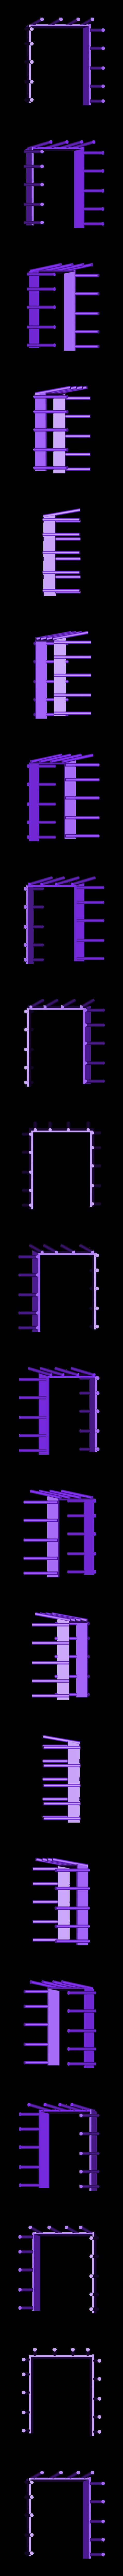 bttm_strakes1.stl Download free STL file Saxon Rustic Cart • 3D printable template, Earsling